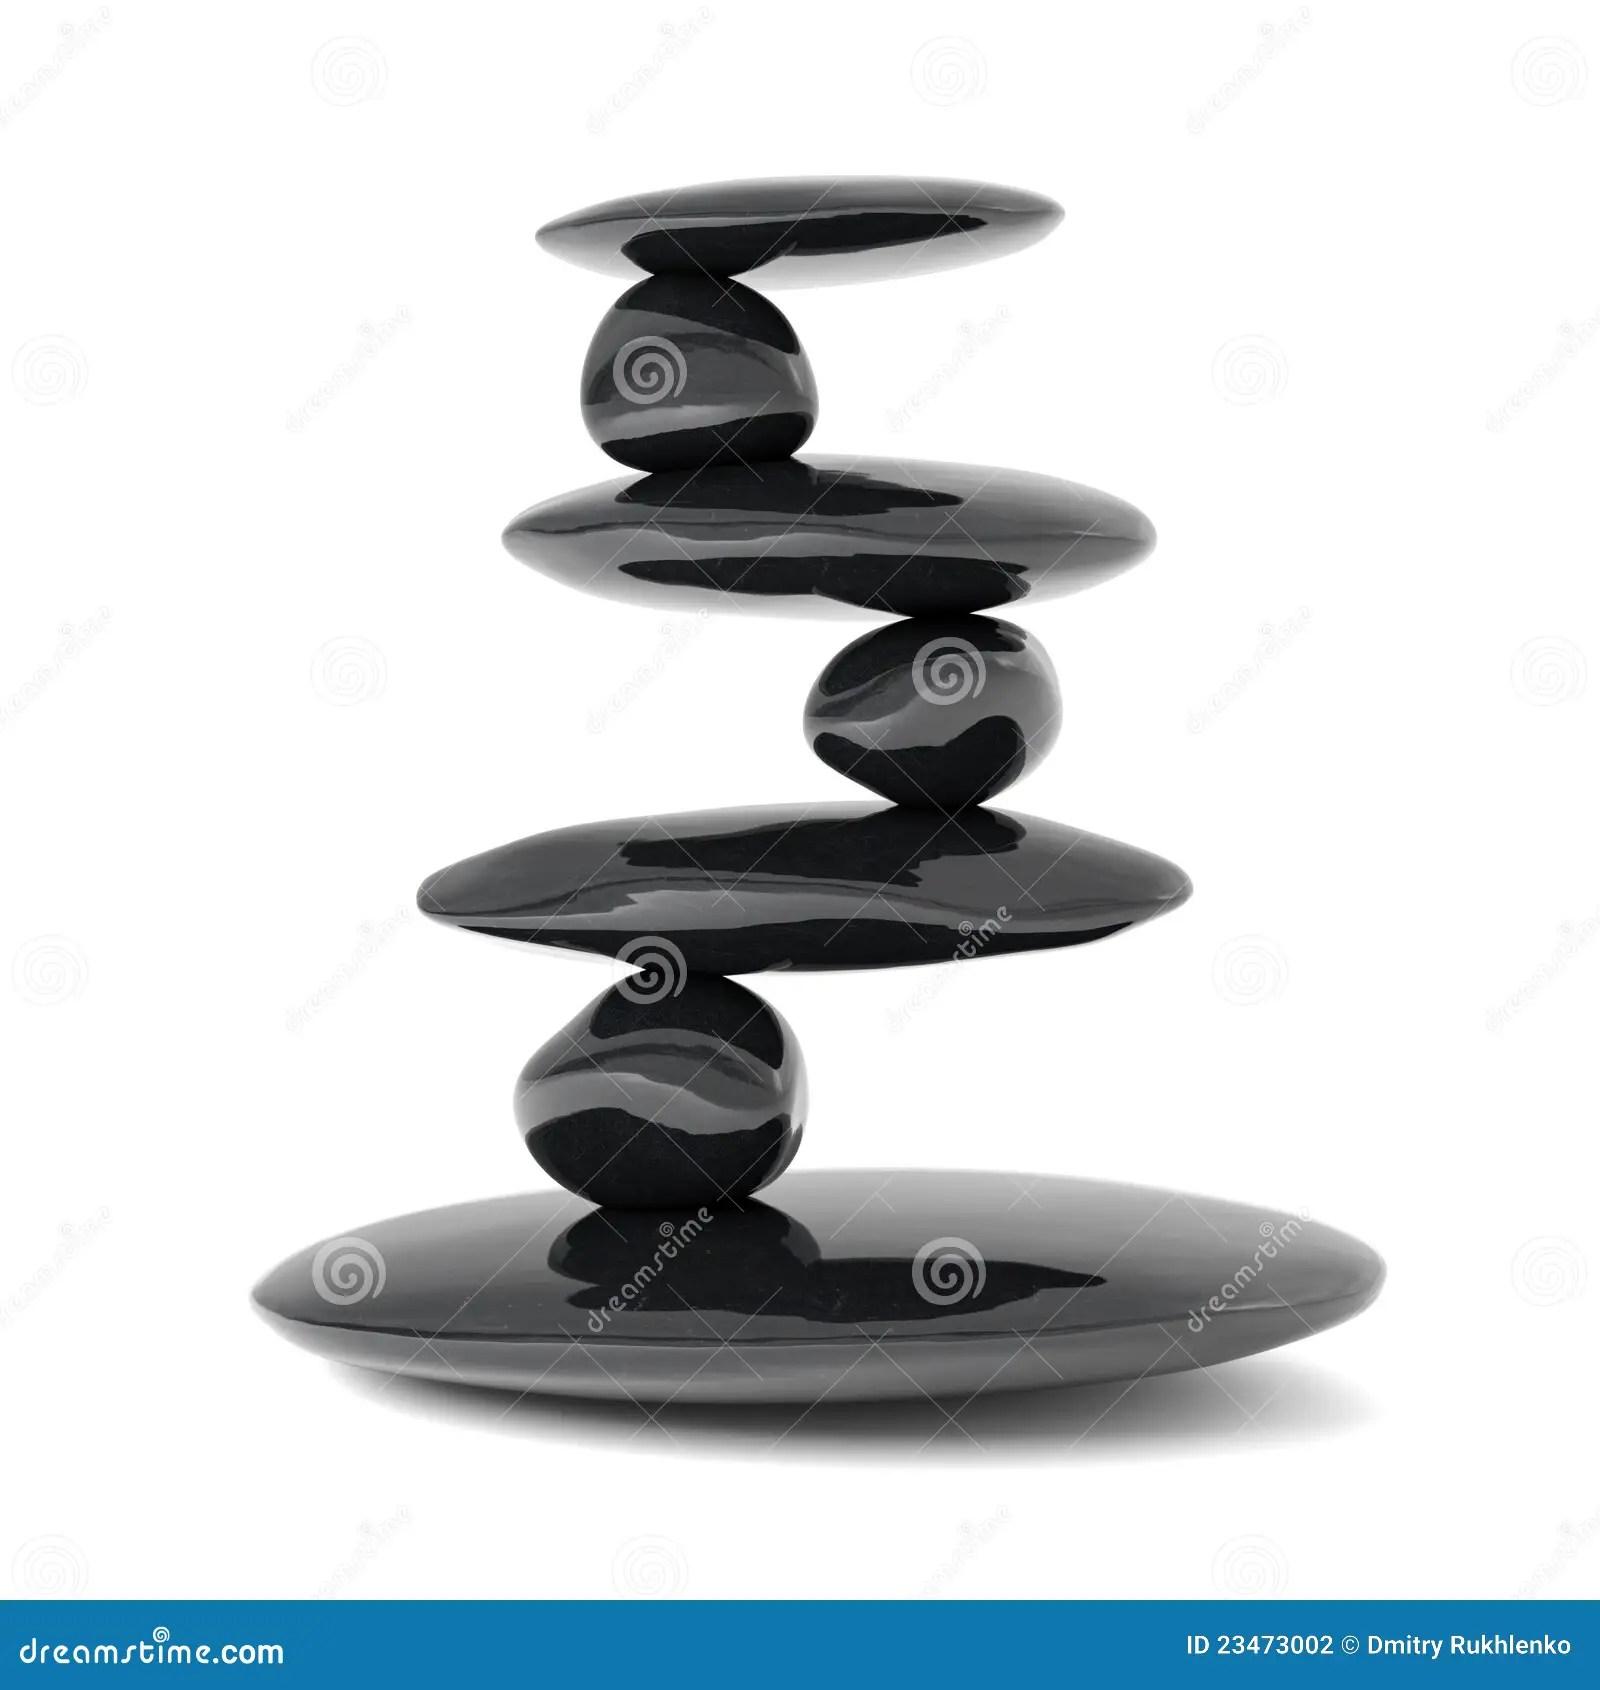 Download Wallpaper Aquarium 3d Zen Stones Balance Concept Stock Photography Image 23473002